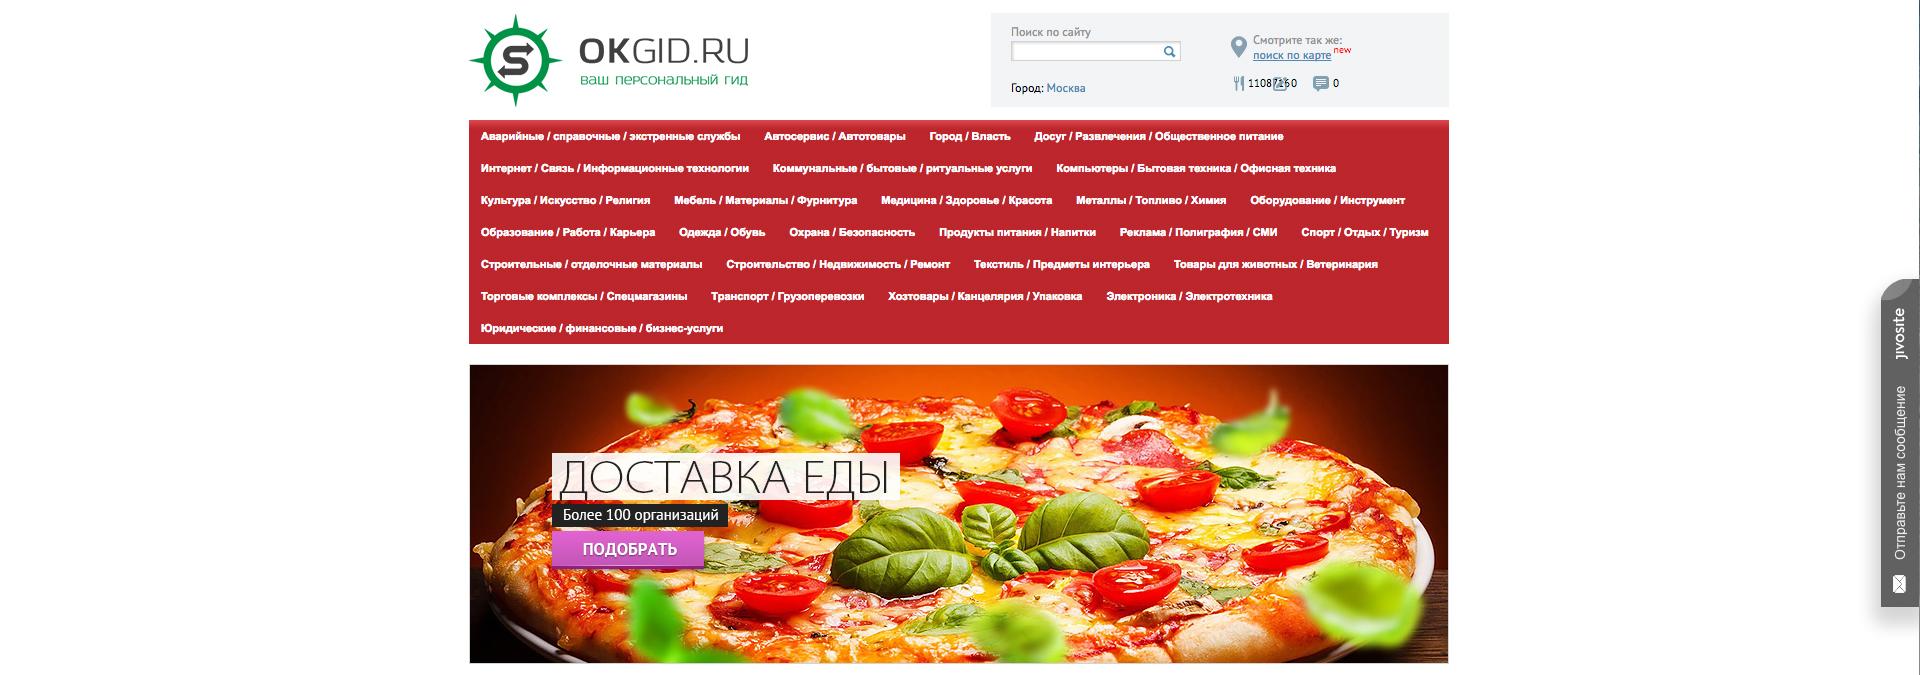 Логотип для сайта OKgid.ru фото f_40457d25cb7f26d6.jpg